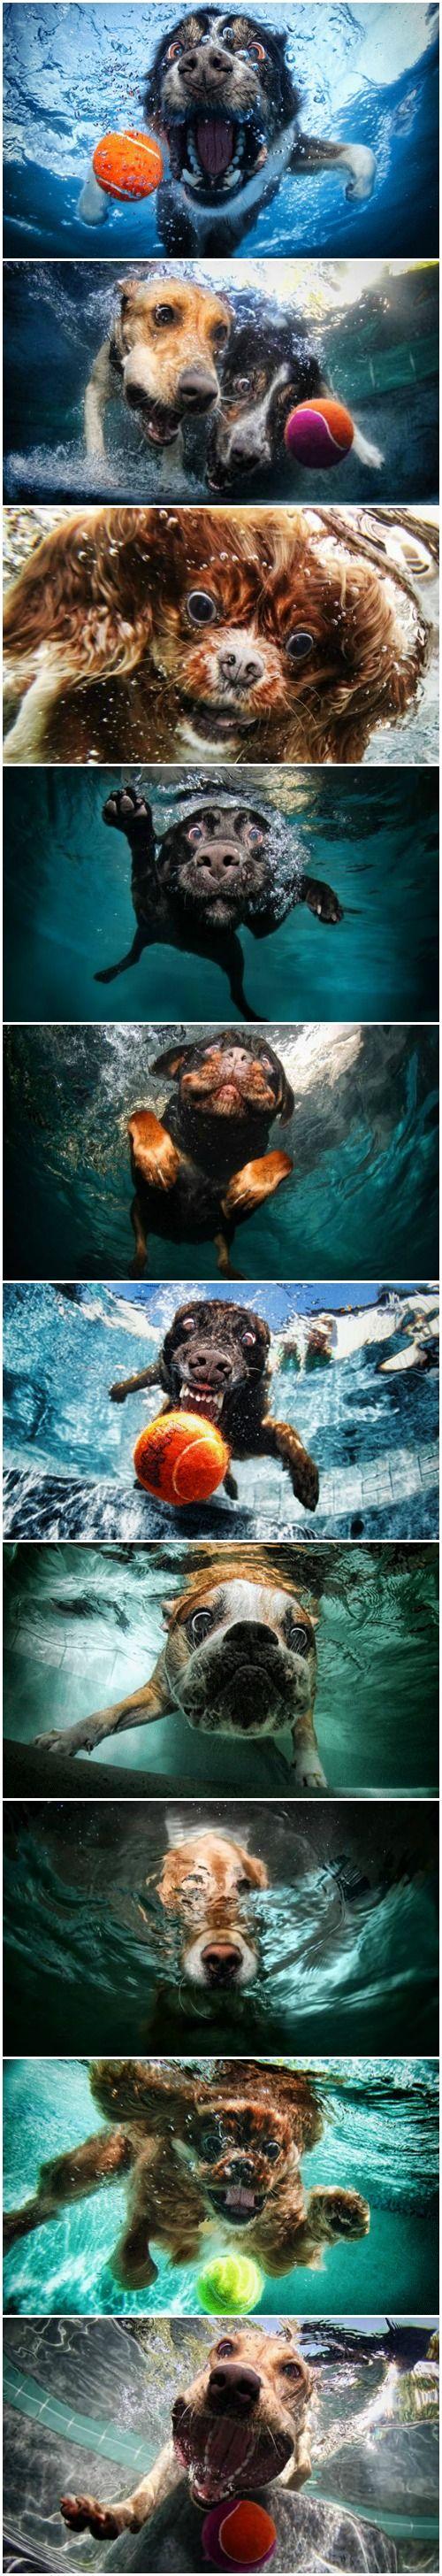 underwater dogs ~pets ~ pet goodies ~ pet collectibles Pinterest